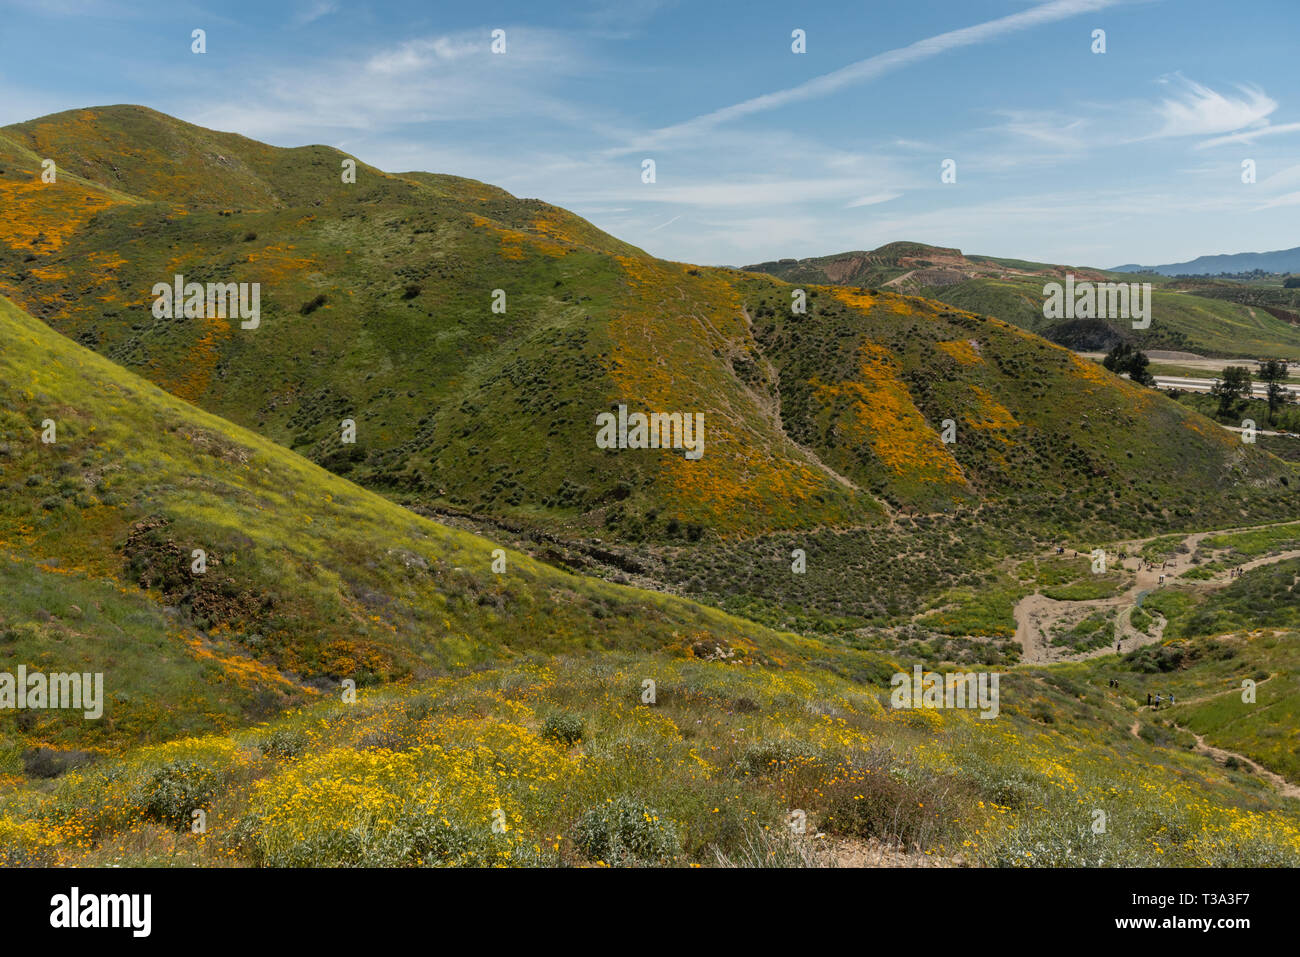 Beautiful superbloom vista in a mountain range near Lake Elsinore, Southern California Stock Photo